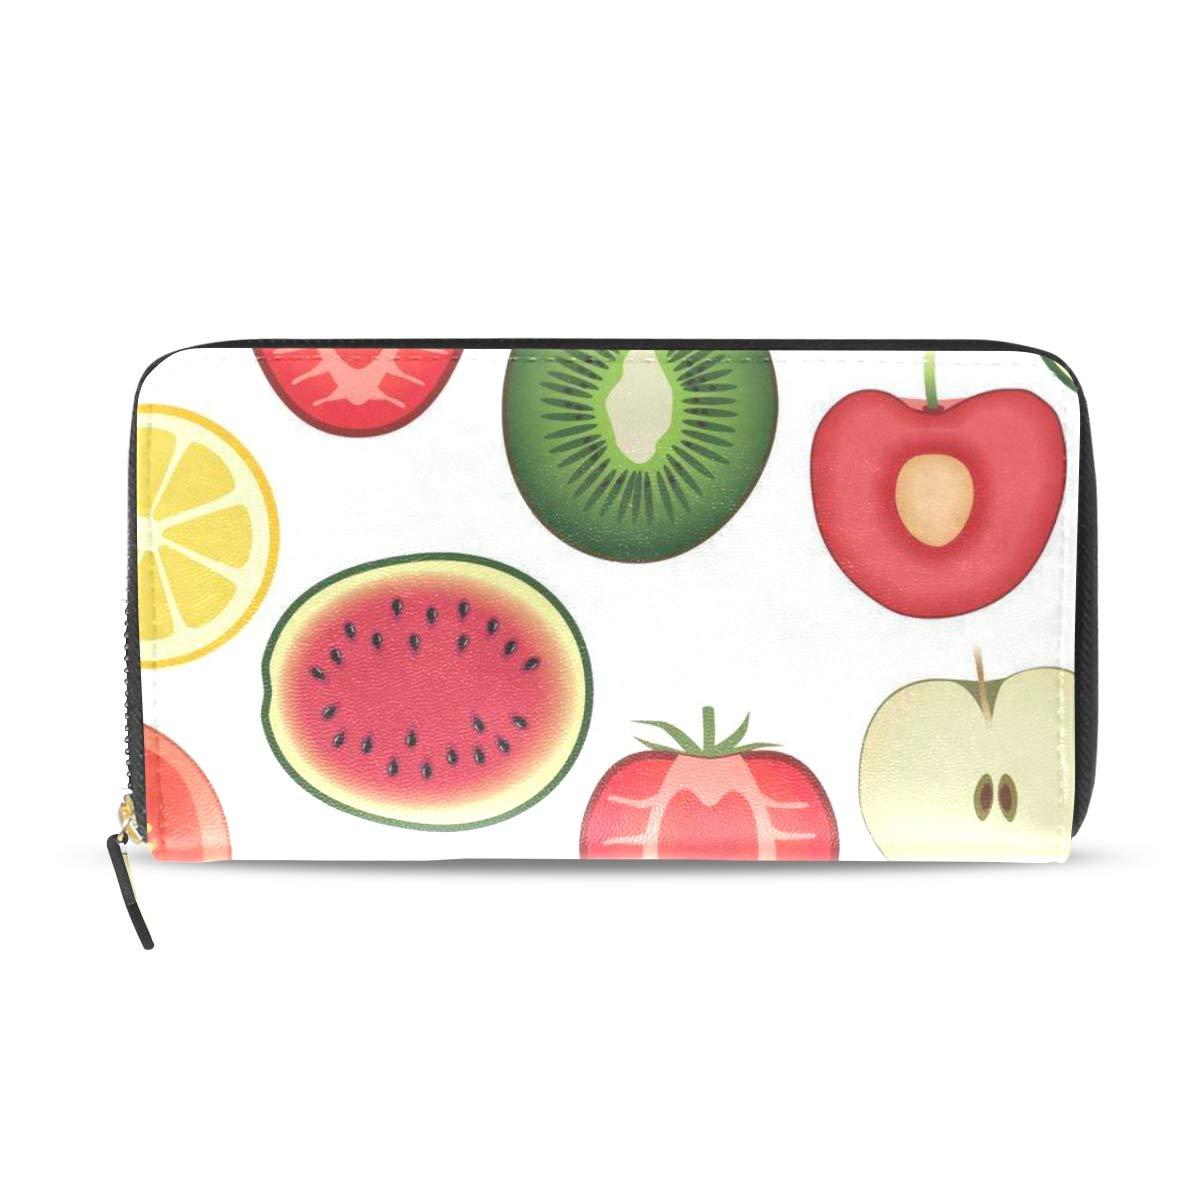 Womens Wallets Apple Cup Cherry Leather Passport Wallet Coin Purse Girls Handbags